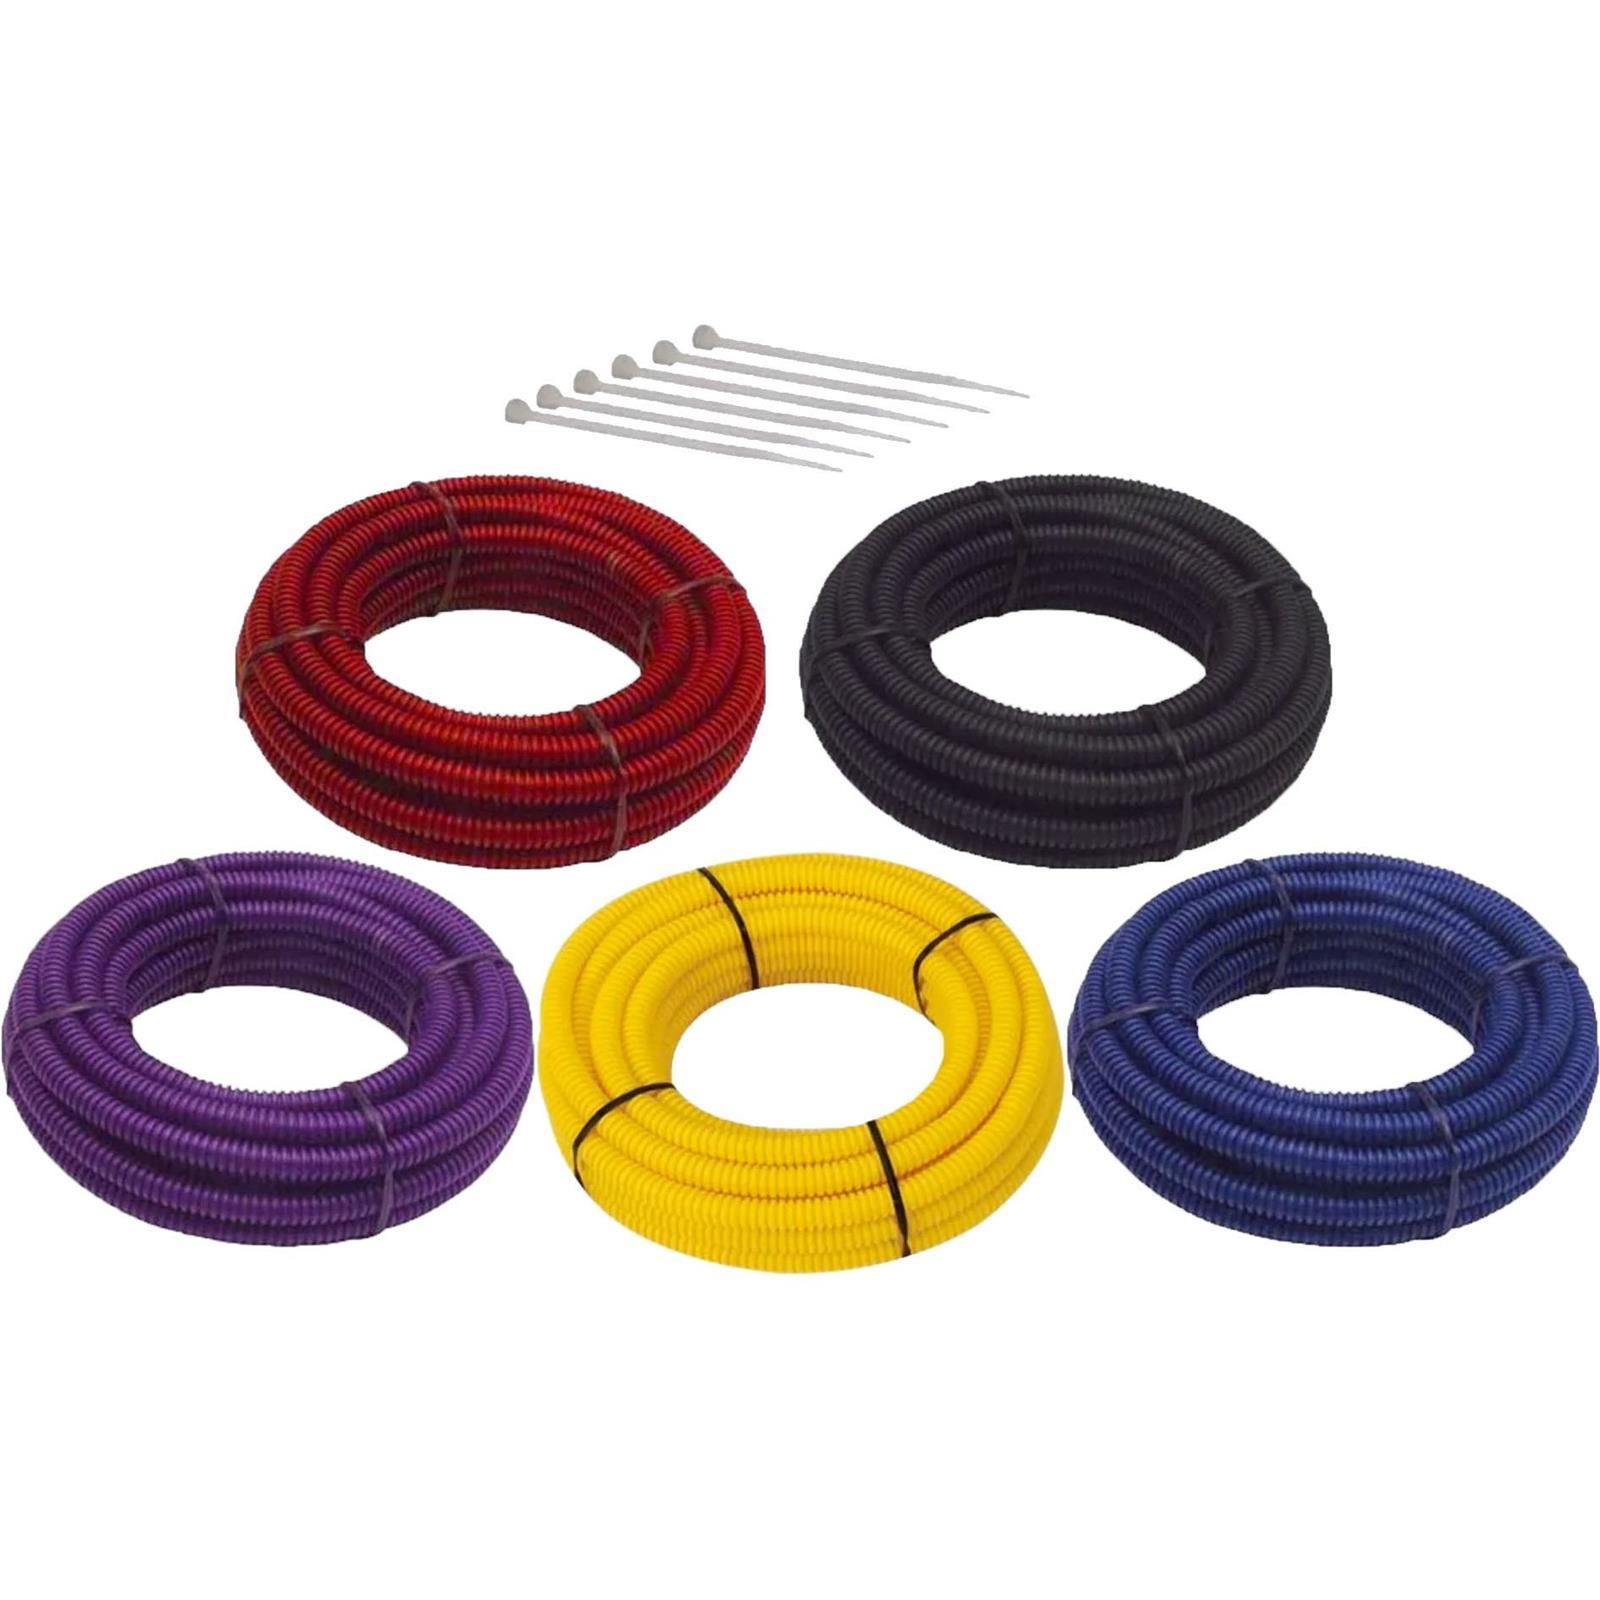 Split Wire Loom Conduit Tubing 1 4 Inch Diameter 20 Ft Long